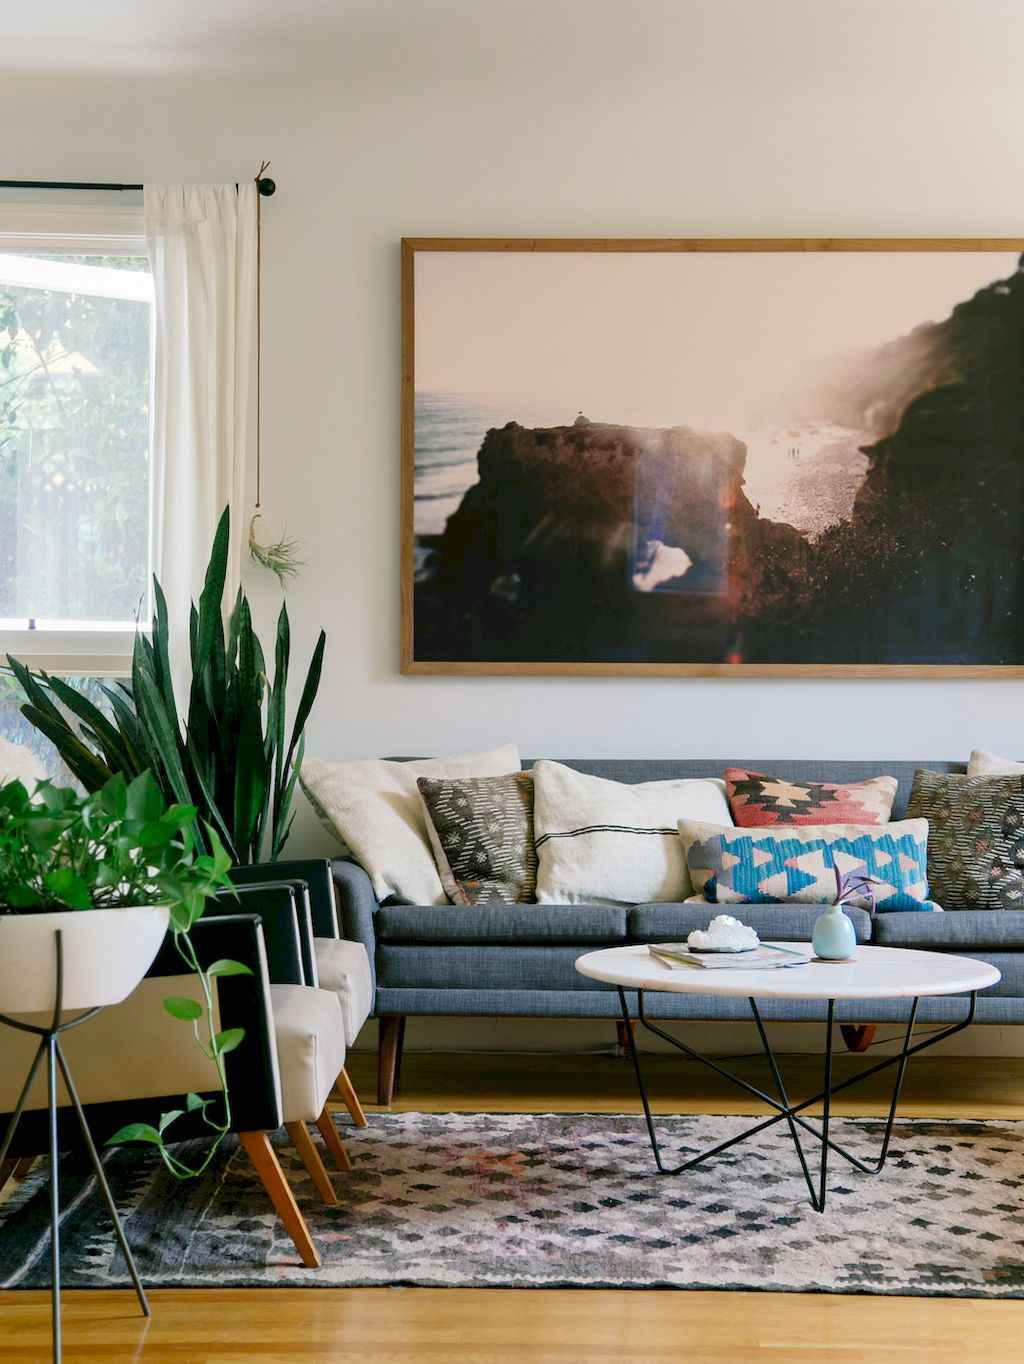 Simple clean vintage living room decorating ideas (48)